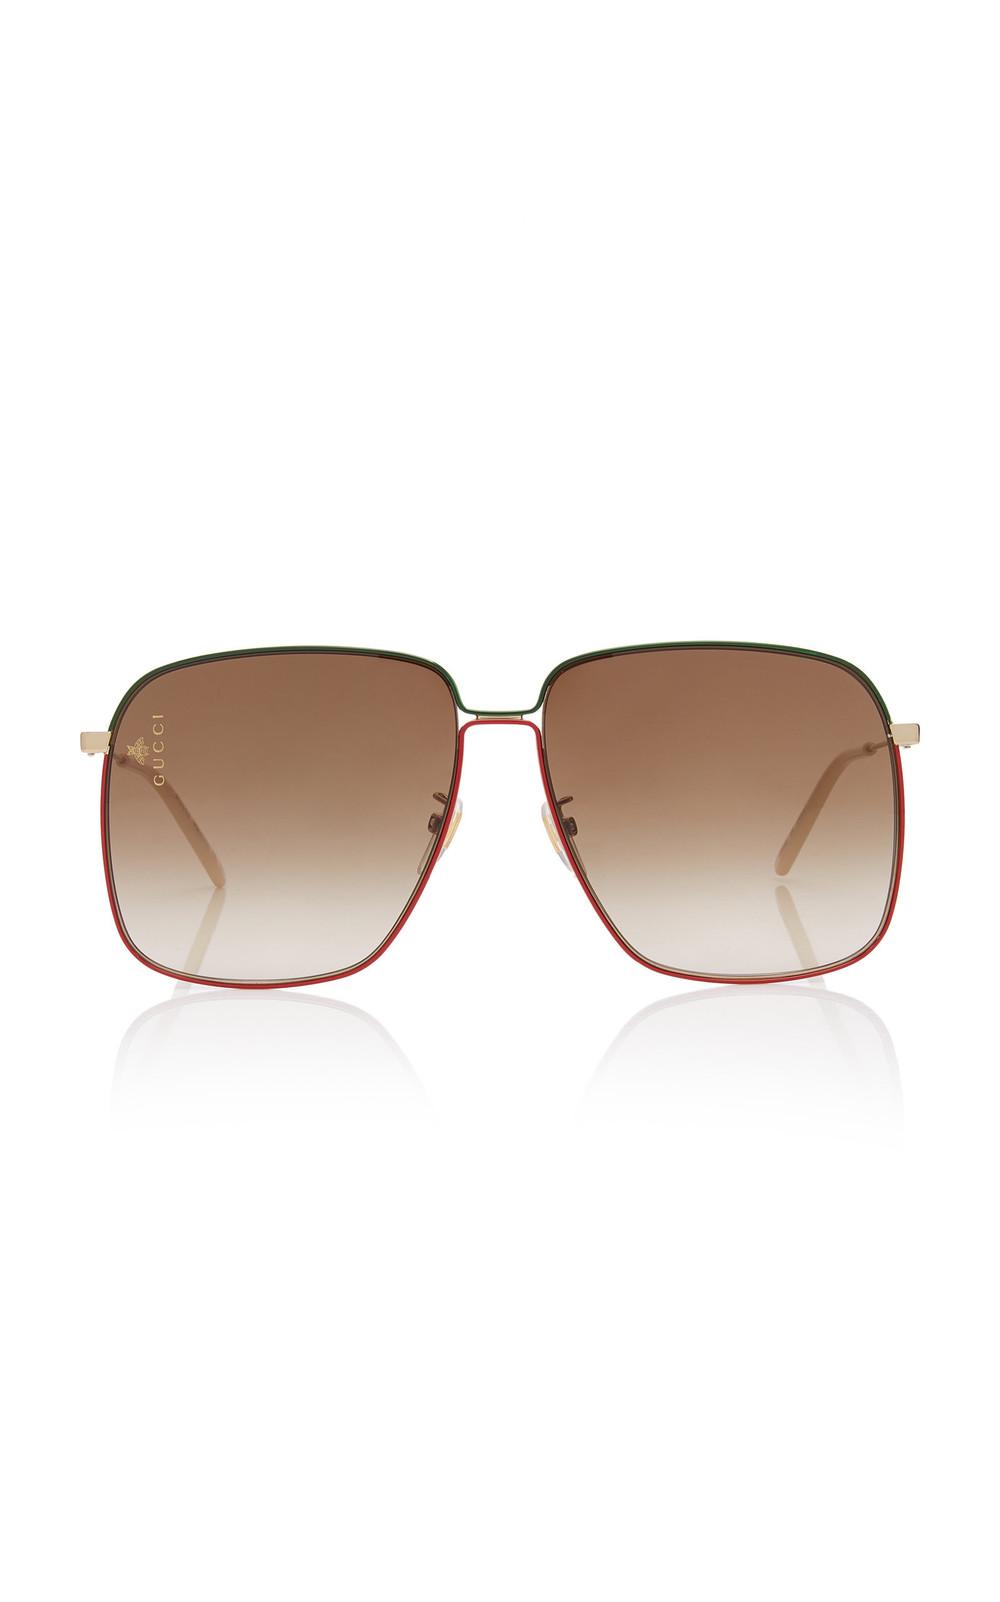 Gucci Sunglasses Glasant Oversized Metal Square-Frame Sunglasses in brown